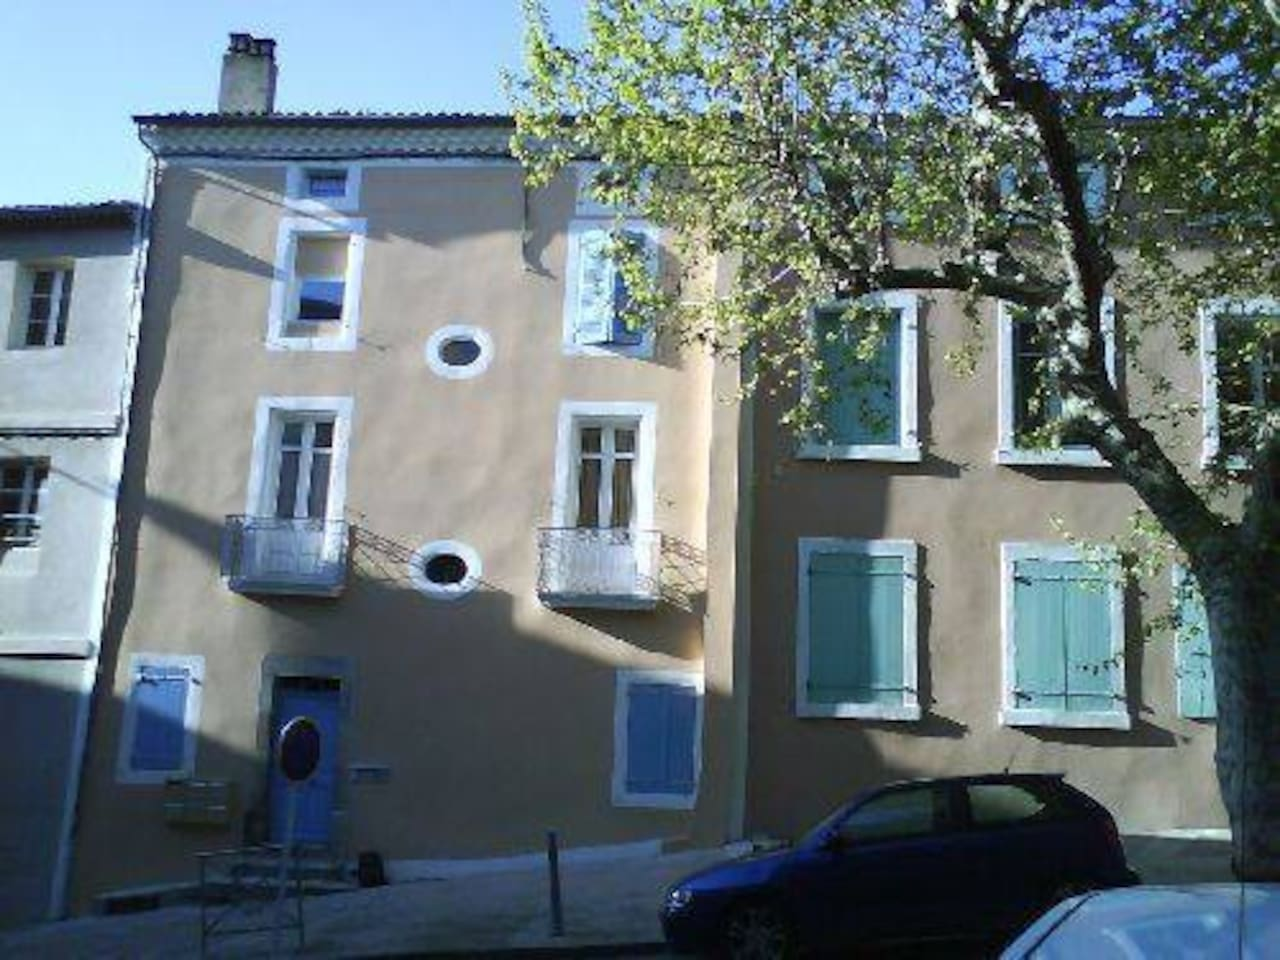 La façade de l'appartement avec appartement avec petits balcons